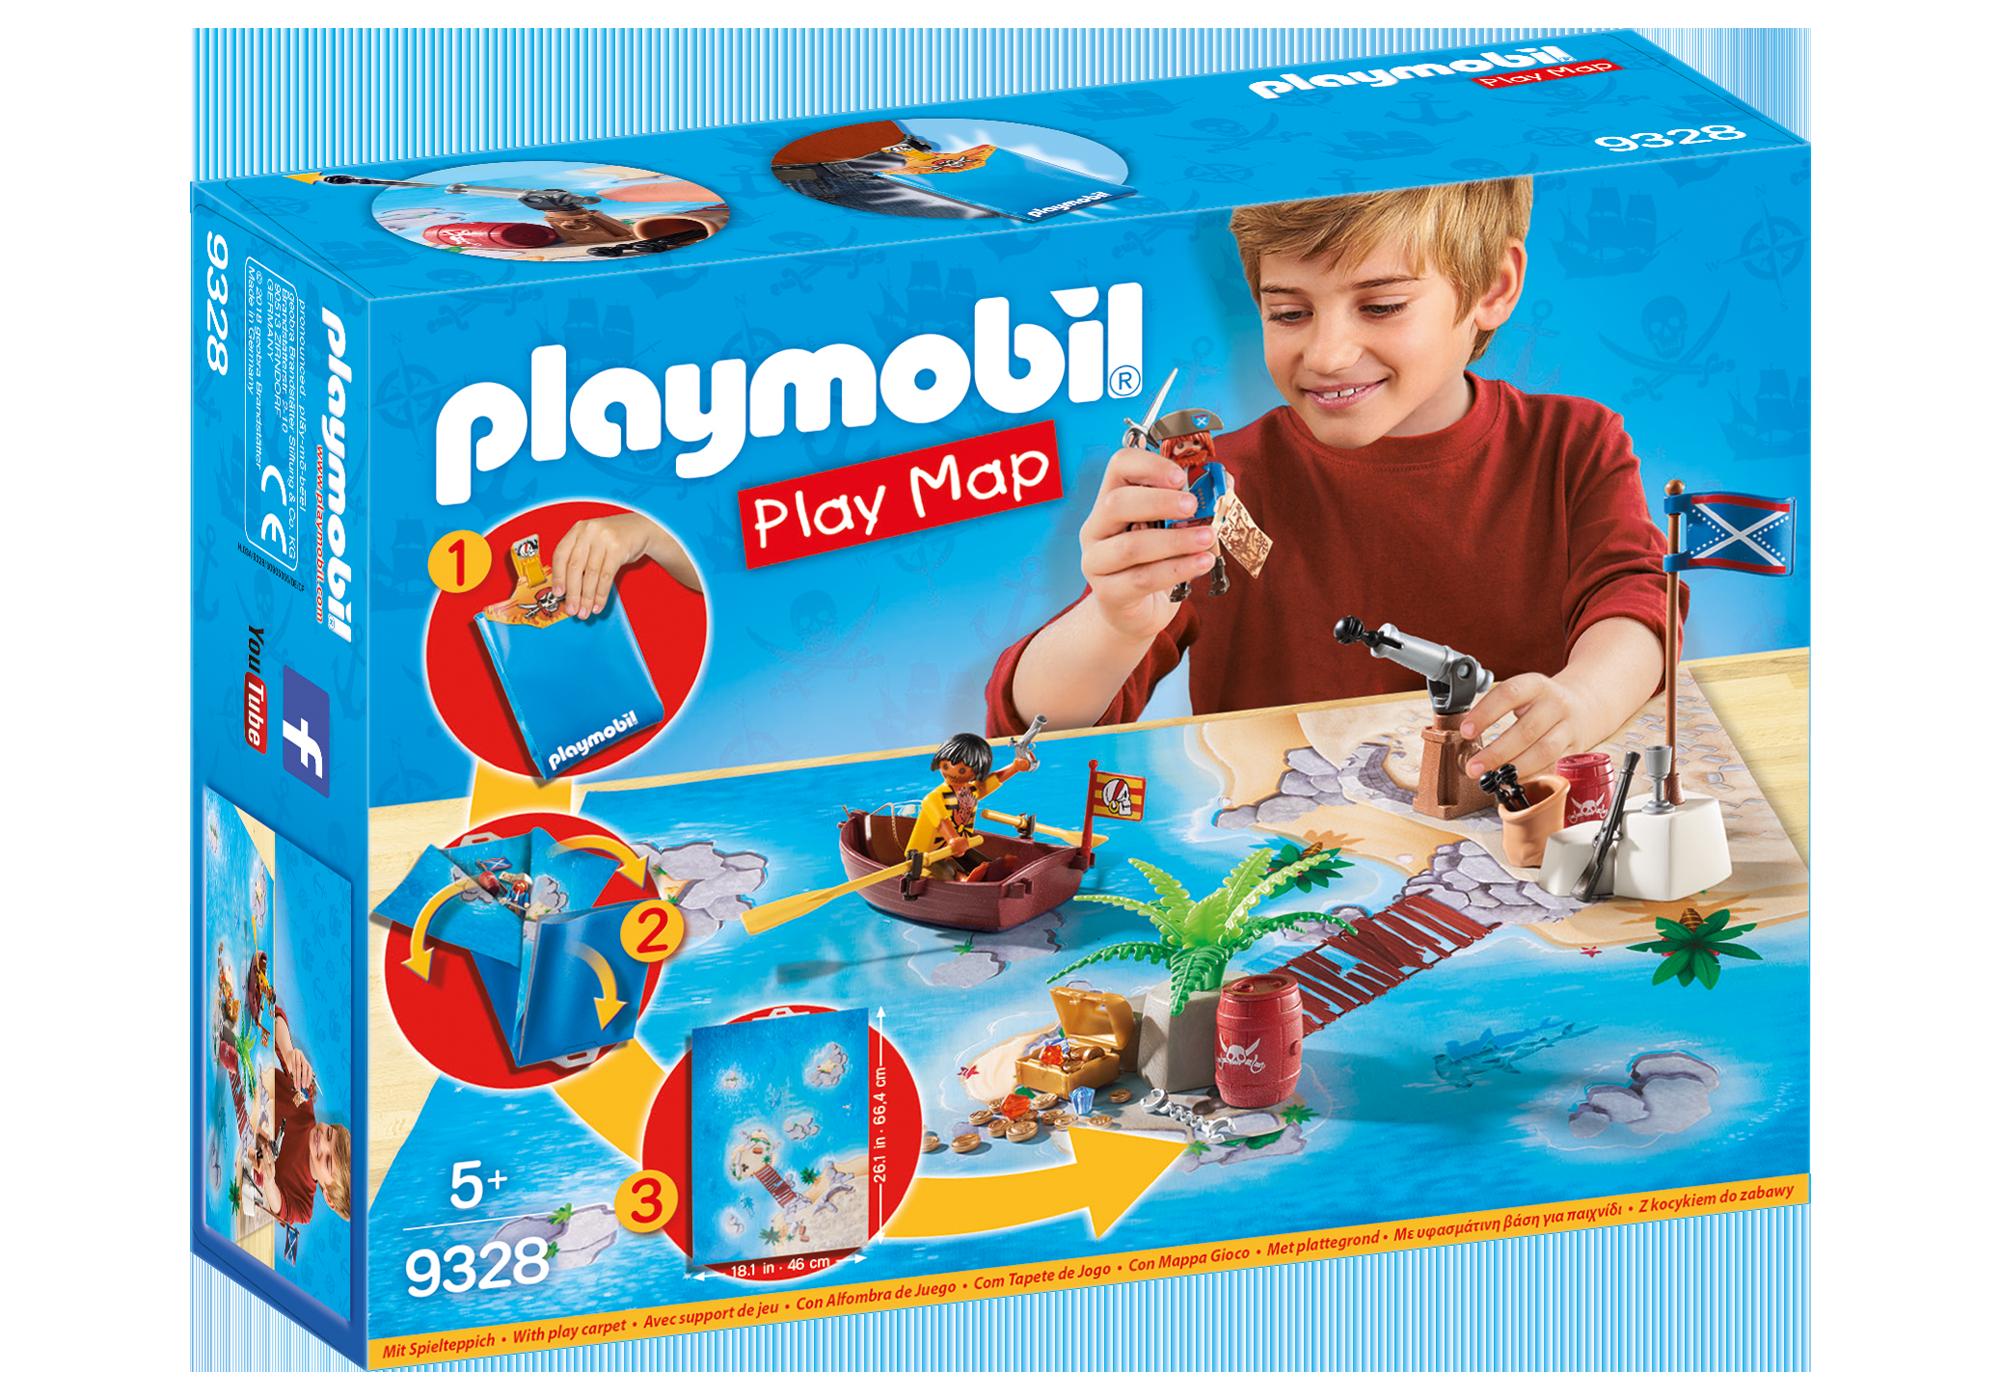 http://media.playmobil.com/i/playmobil/9328_product_box_front/Play Map Piraten